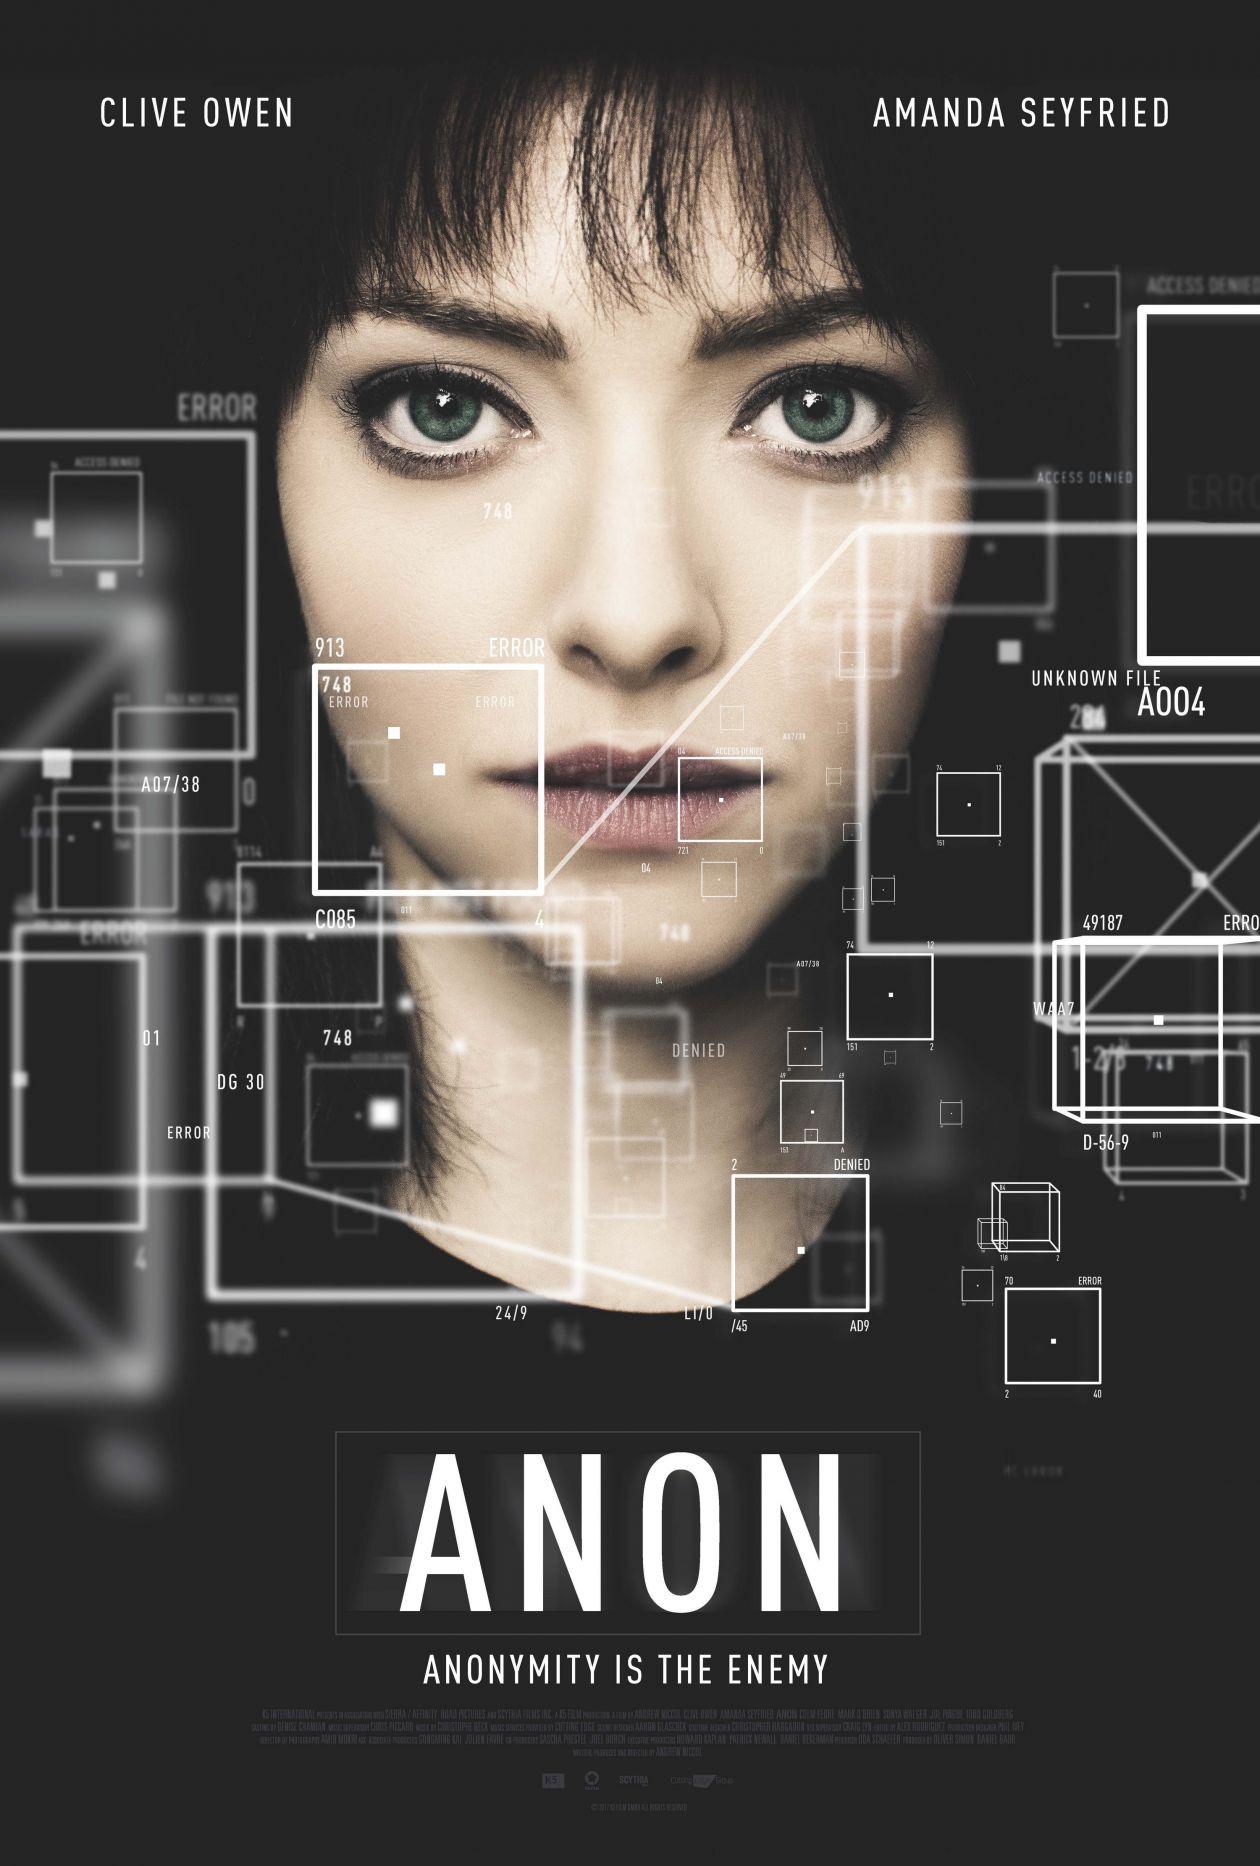 Amanda Seyfried | ANON | Netflix Movie Poster Affiche film